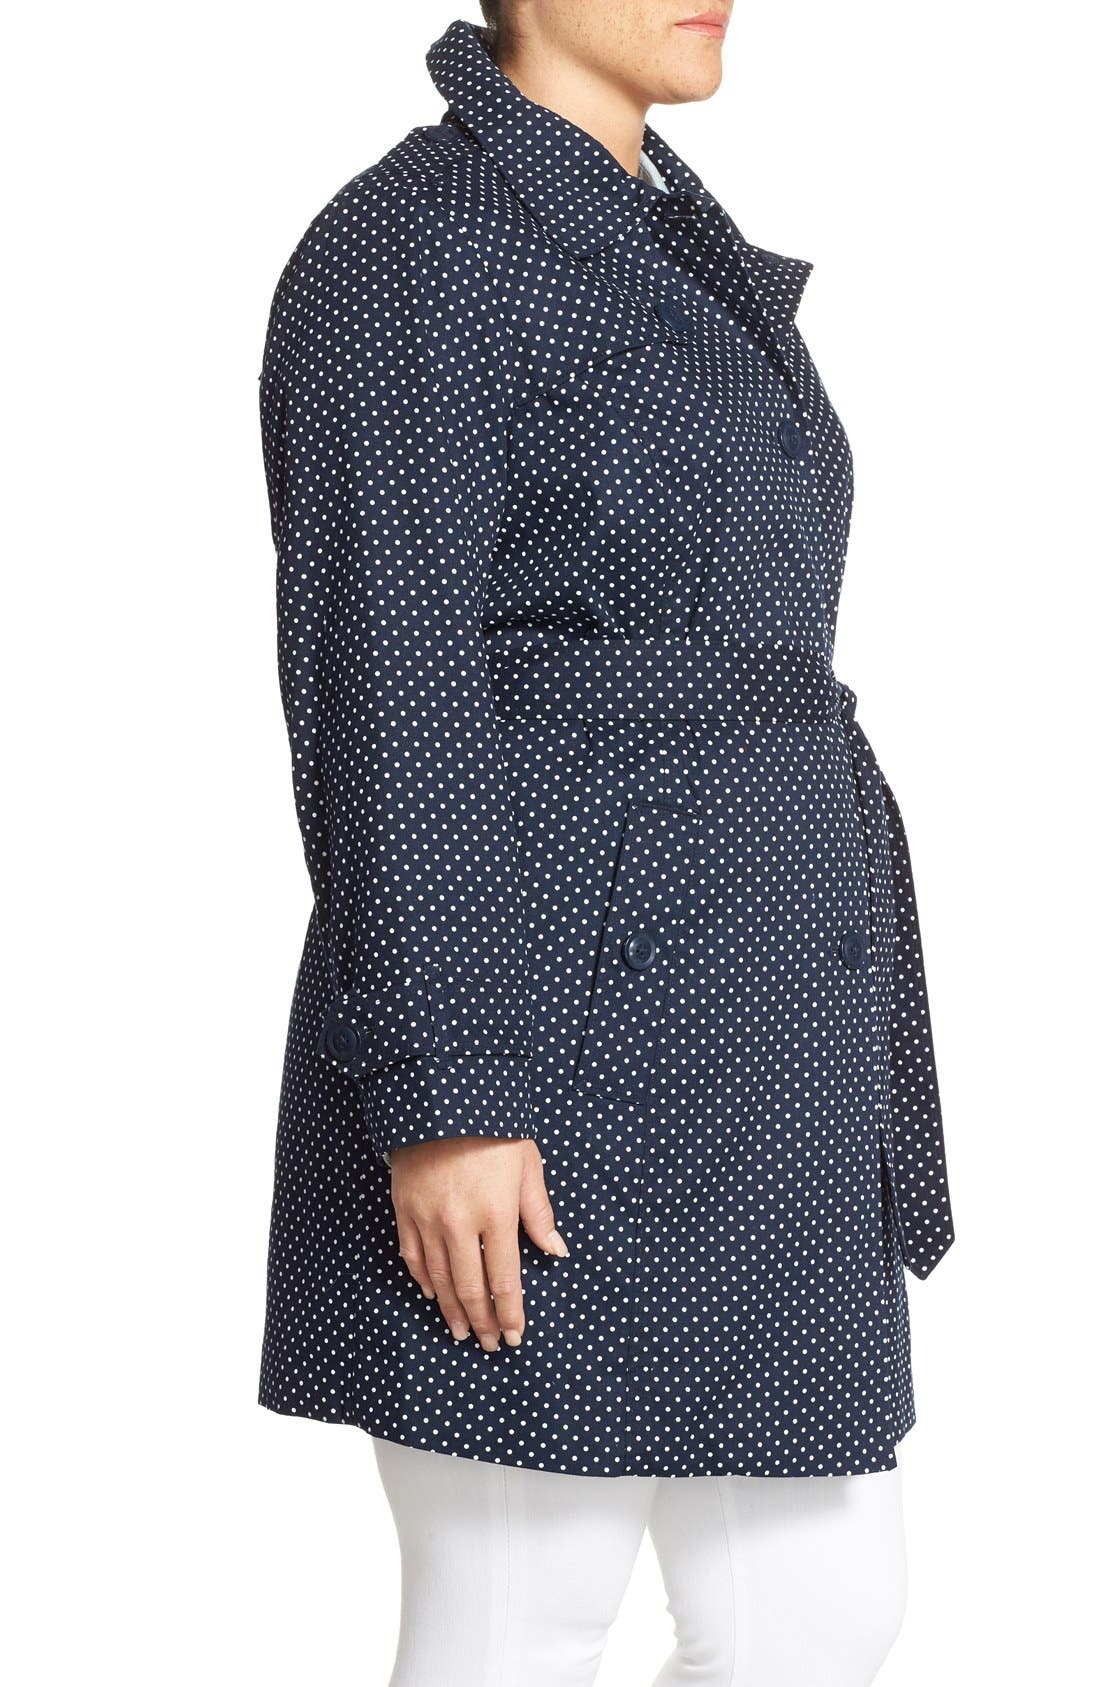 Alternate Image 3  - London Fog Polka Dot Single Breasted Trench Coat (Plus Size)